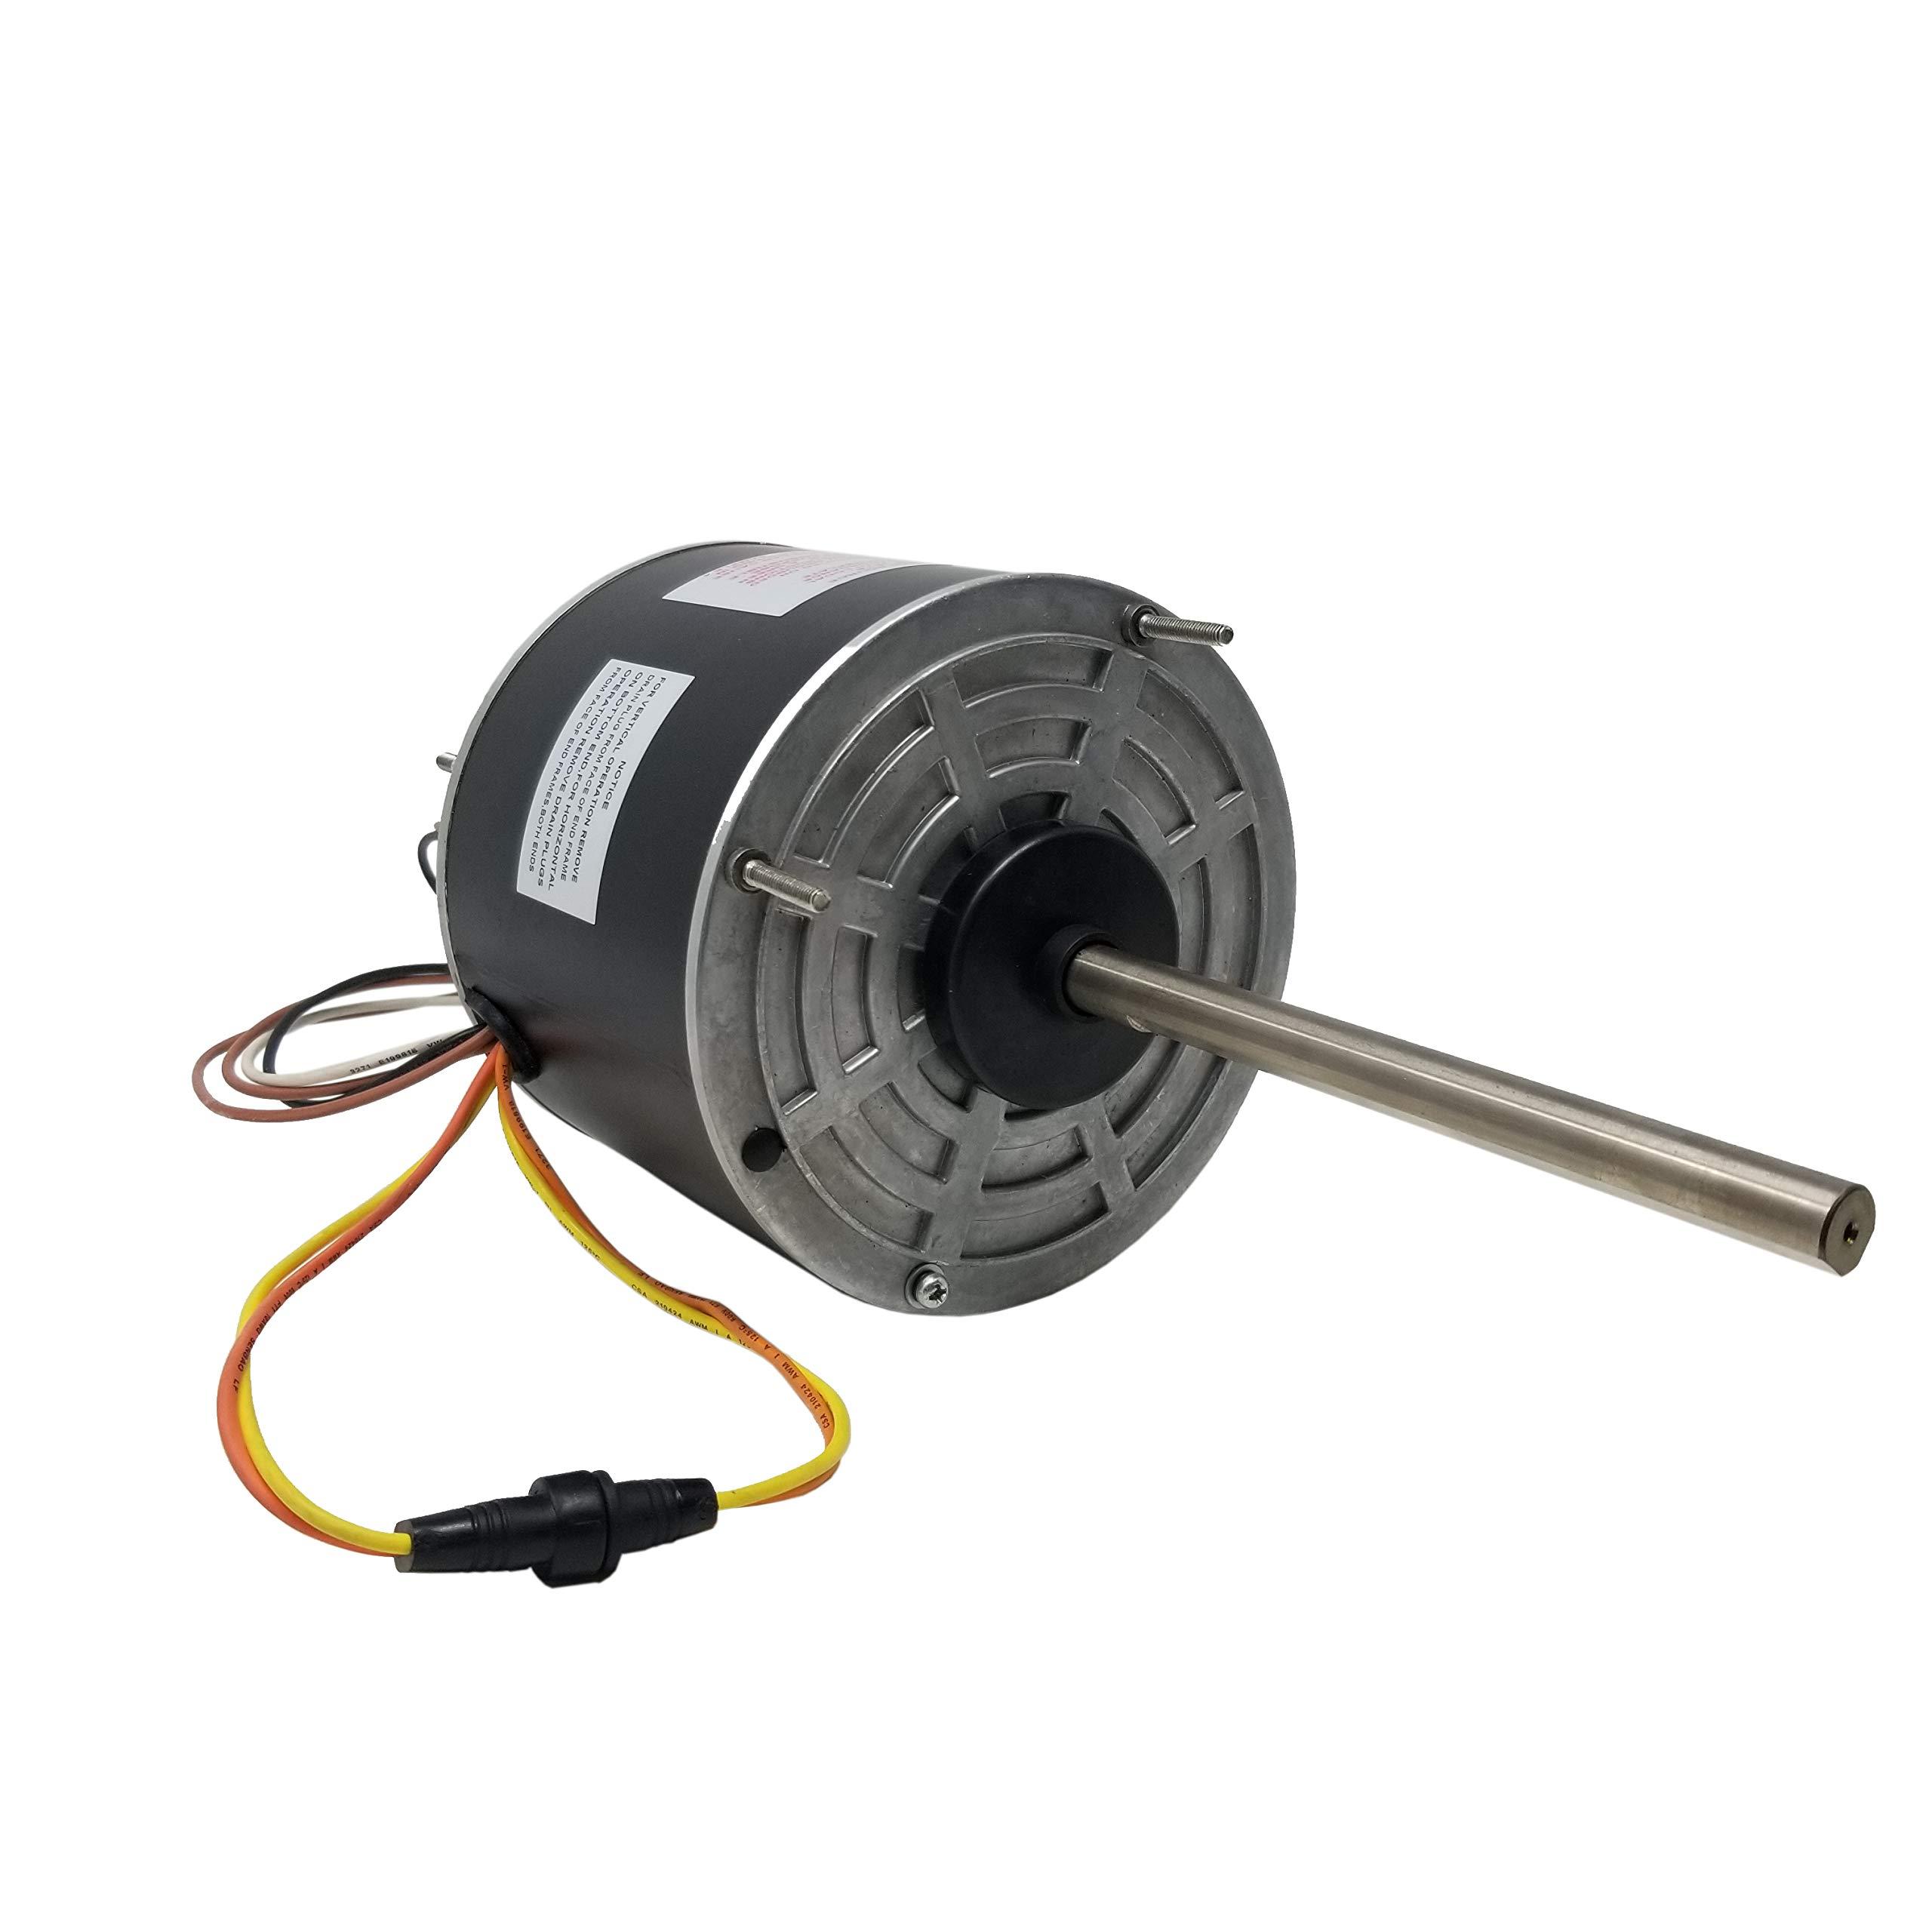 48 Frame Condenser Motor | Replaces: A.O. Smith FSE1026SV1 by P-Tech (Image #4)